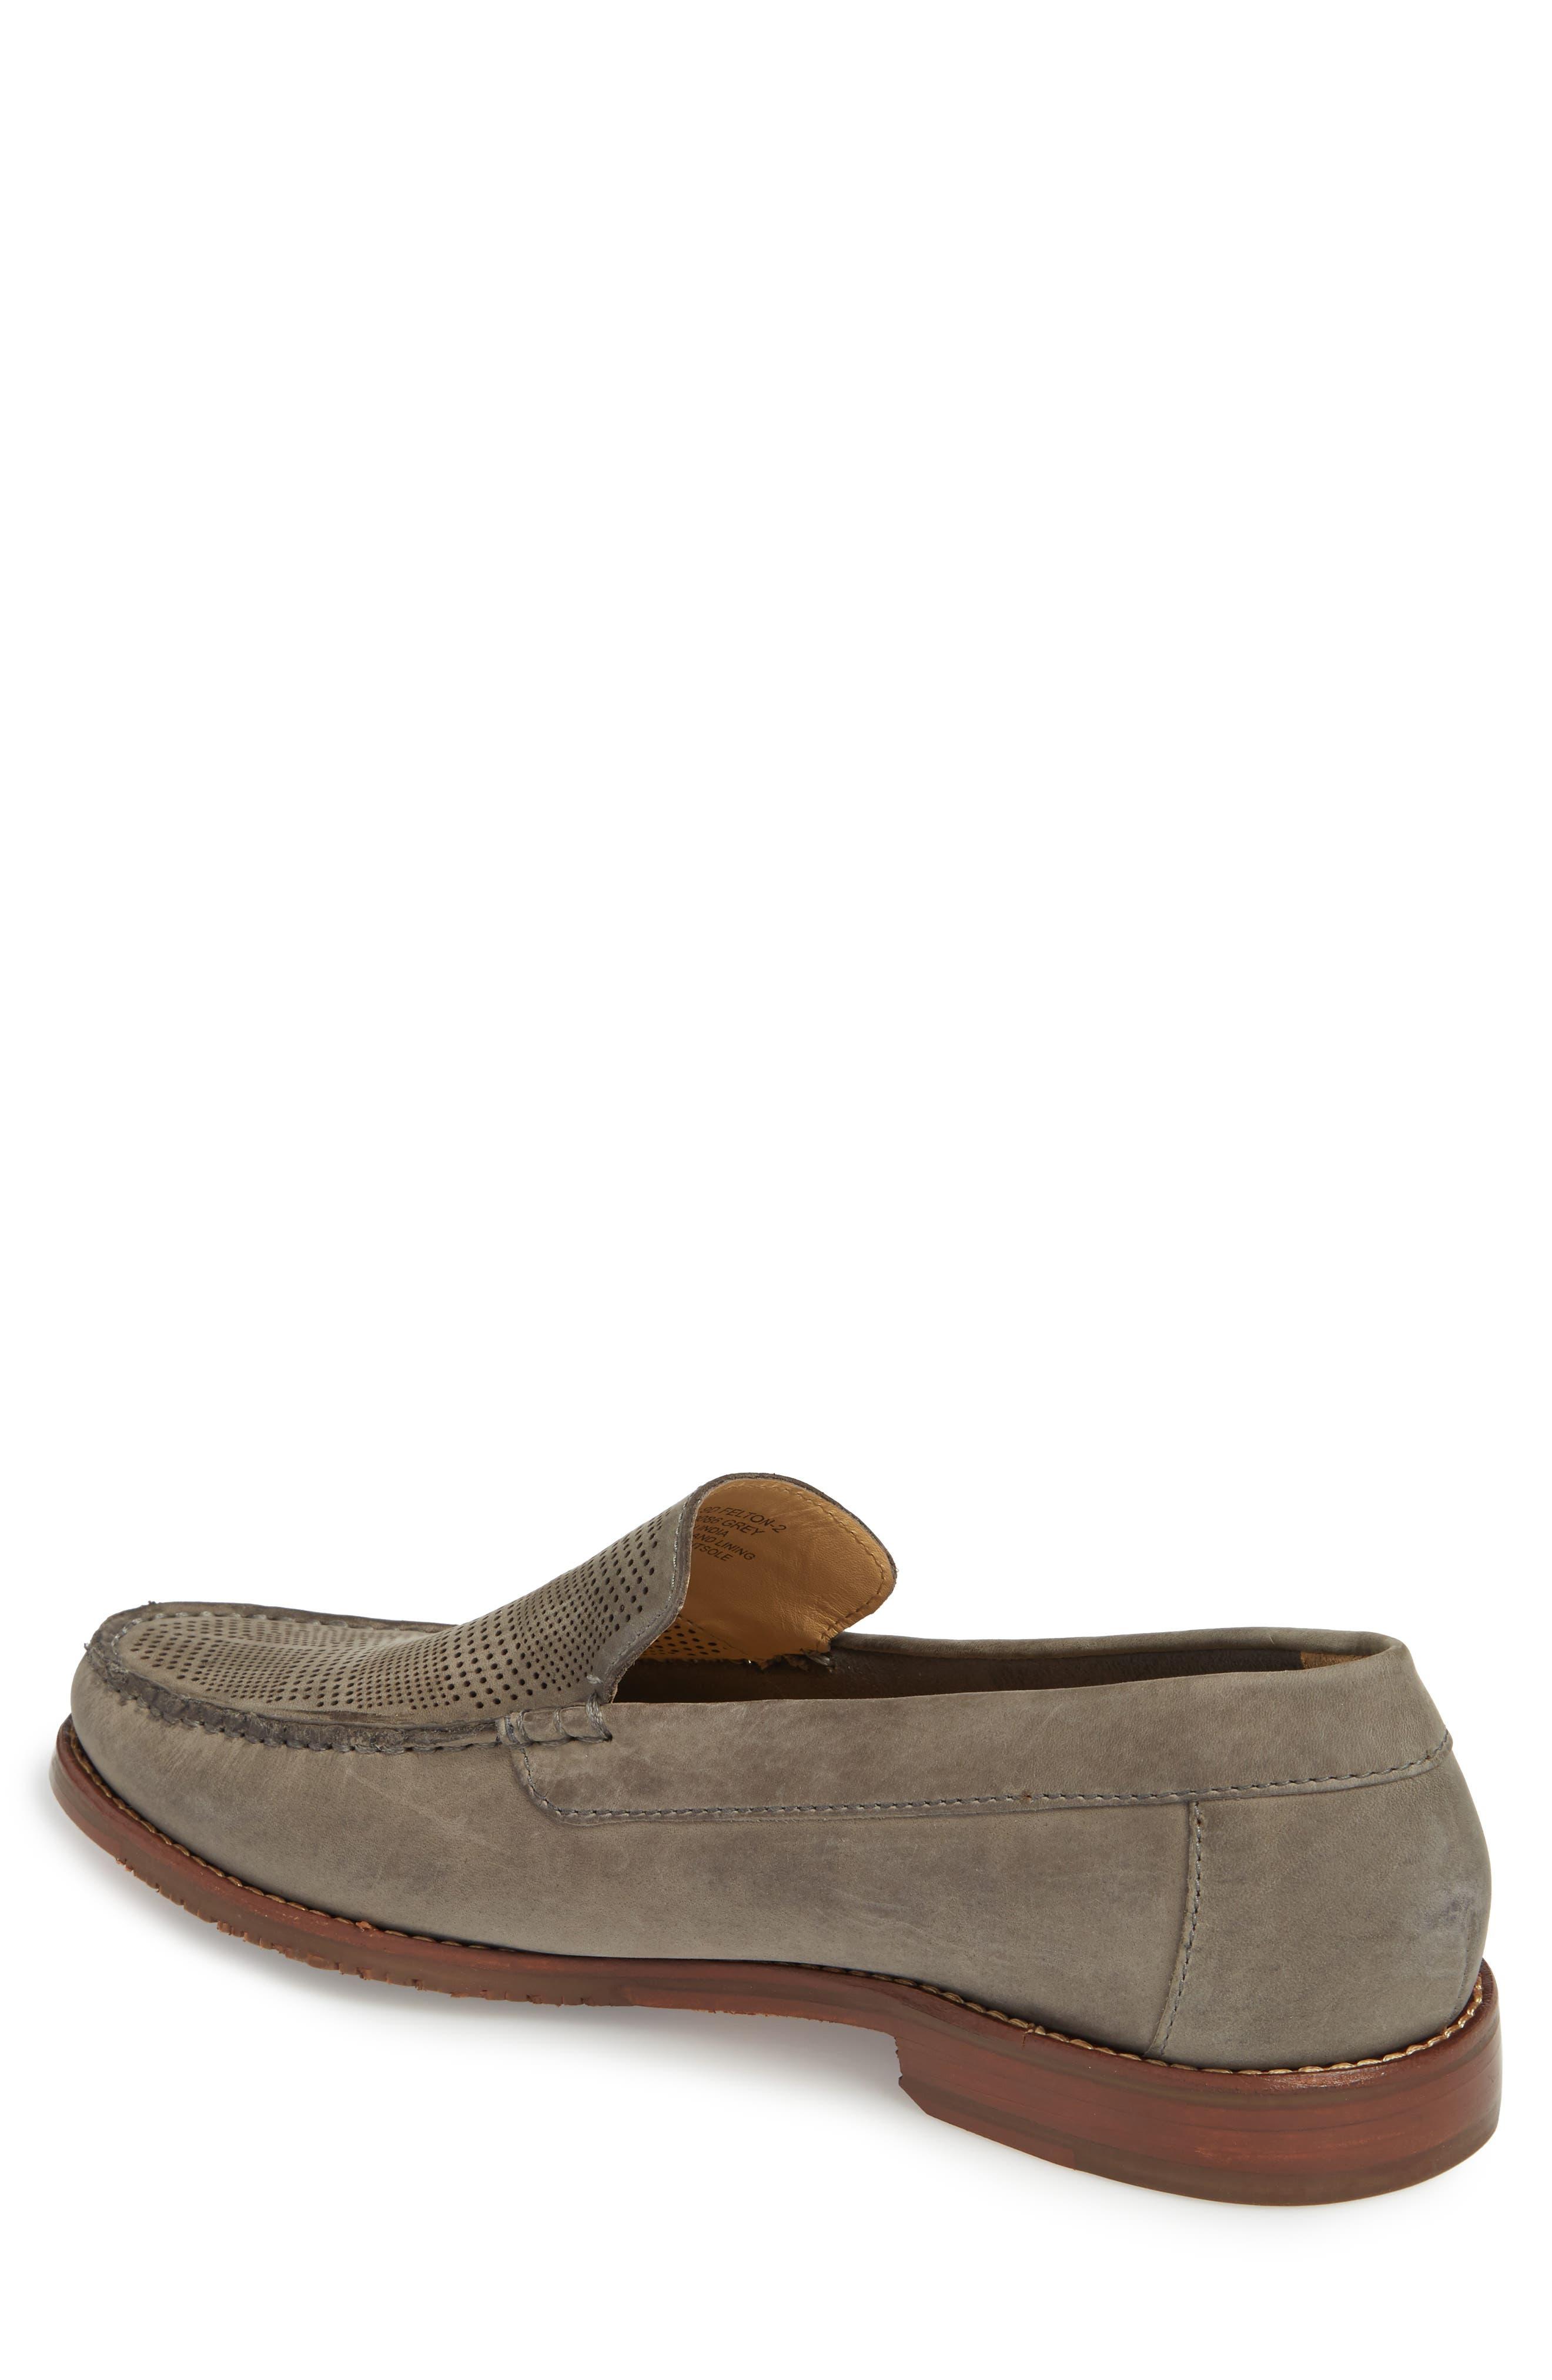 Felton II Venetian Loafer,                             Alternate thumbnail 2, color,                             Grey Nubuck